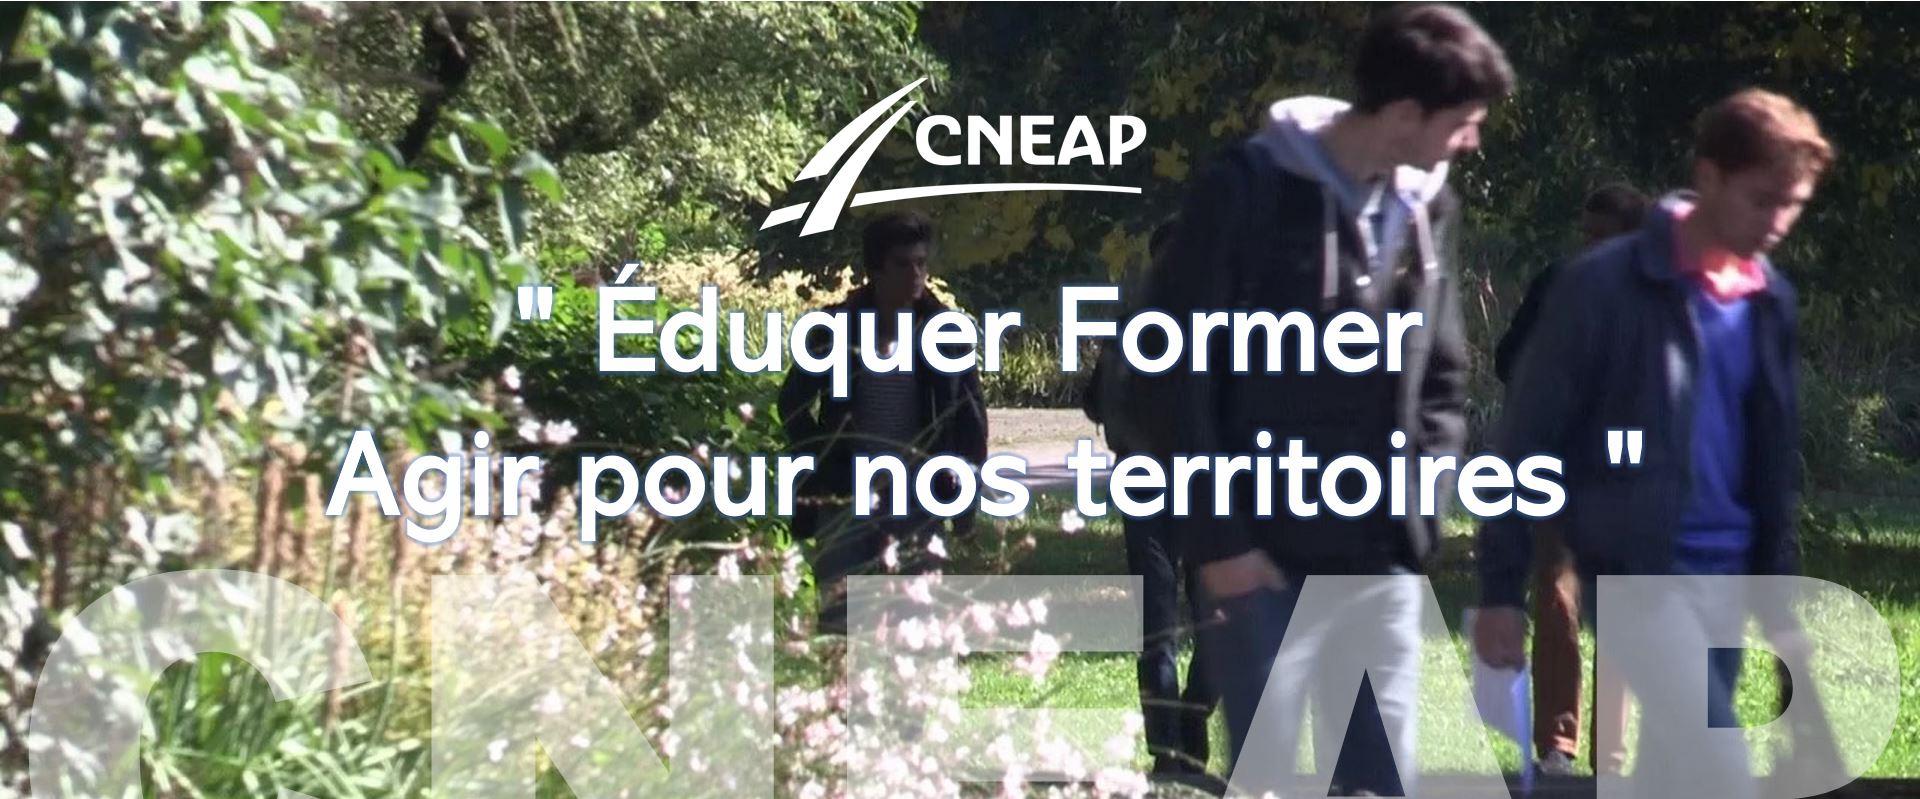 photo_homepage_eportfolio_cneap_logo.jpg